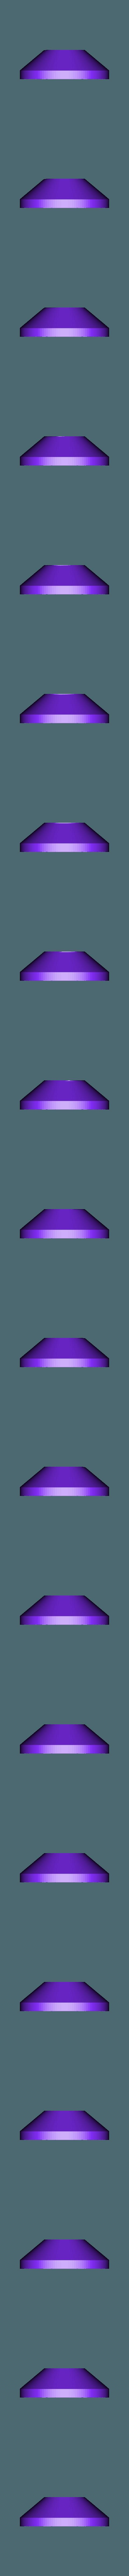 spool_holder_knob_xl.stl Download free STL file Spool holder for 2020 Extrusions (Deltas) • Model to 3D print, AlkinsDesigns